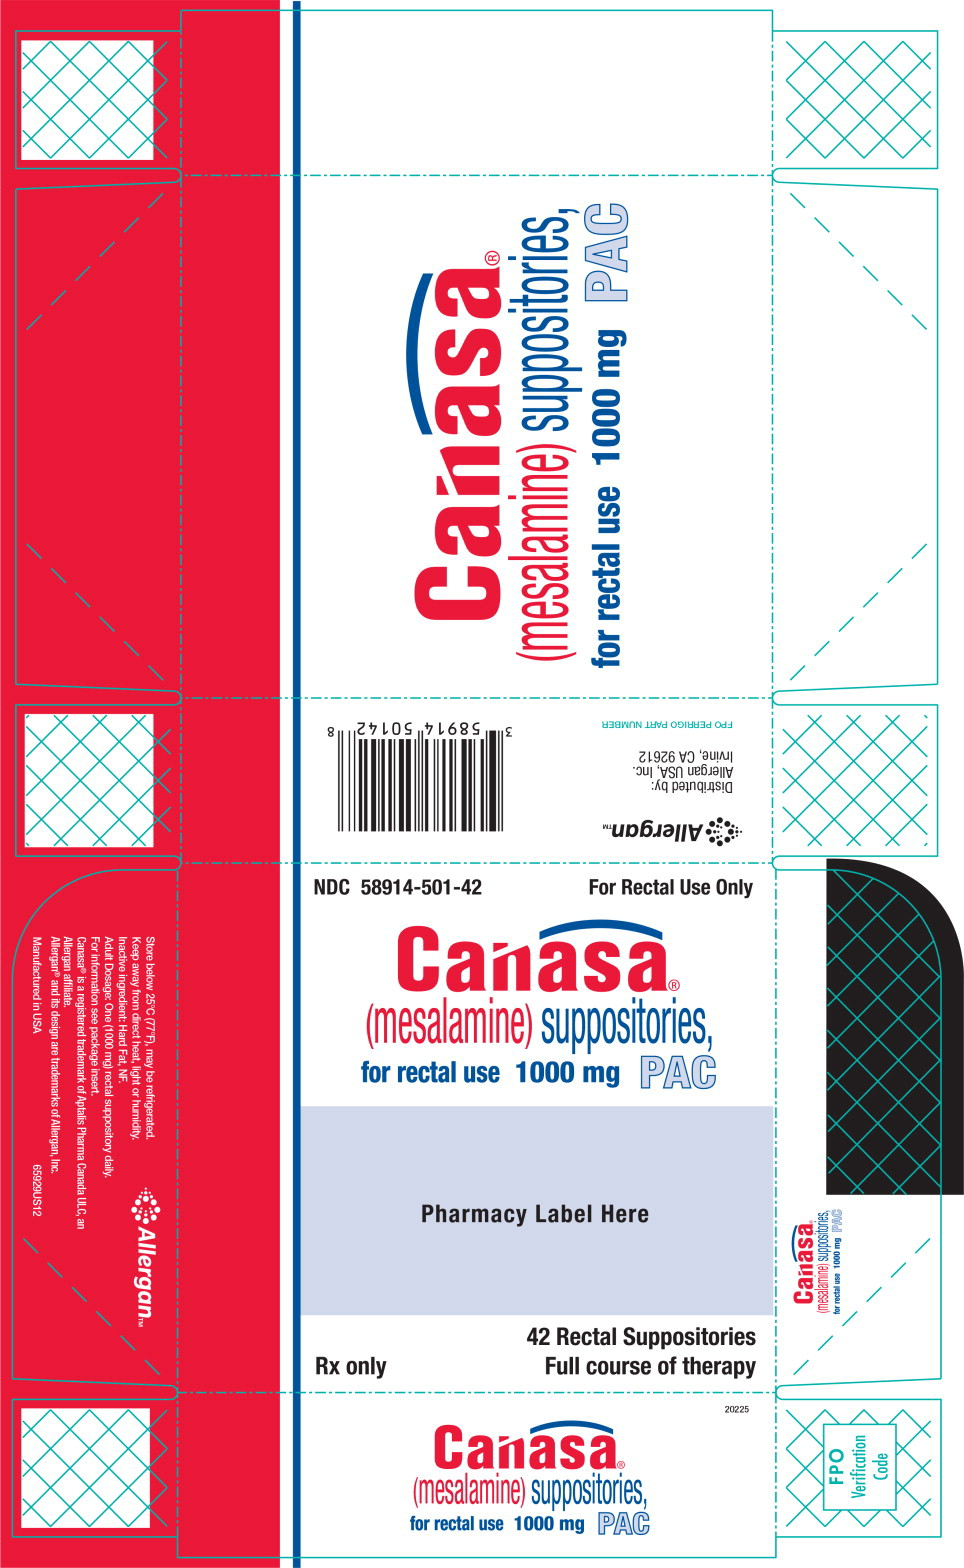 Principal Display Panel - Canasa Carton Label